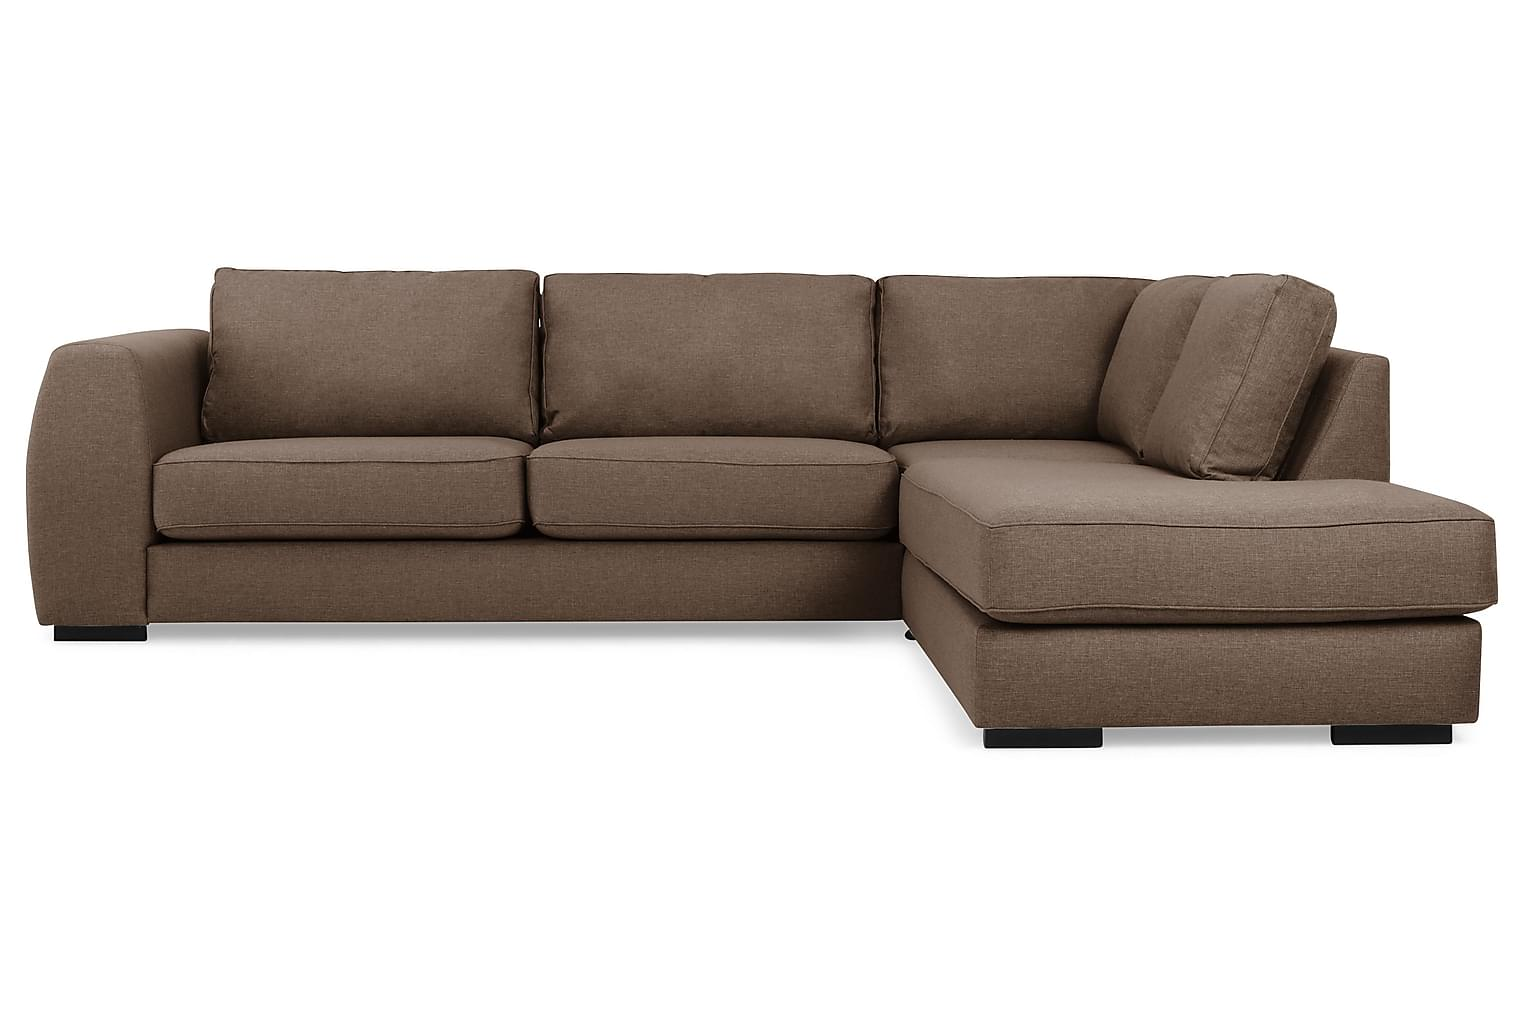 Clarksville CLARKSVILLE L-soffa Höger Brun -